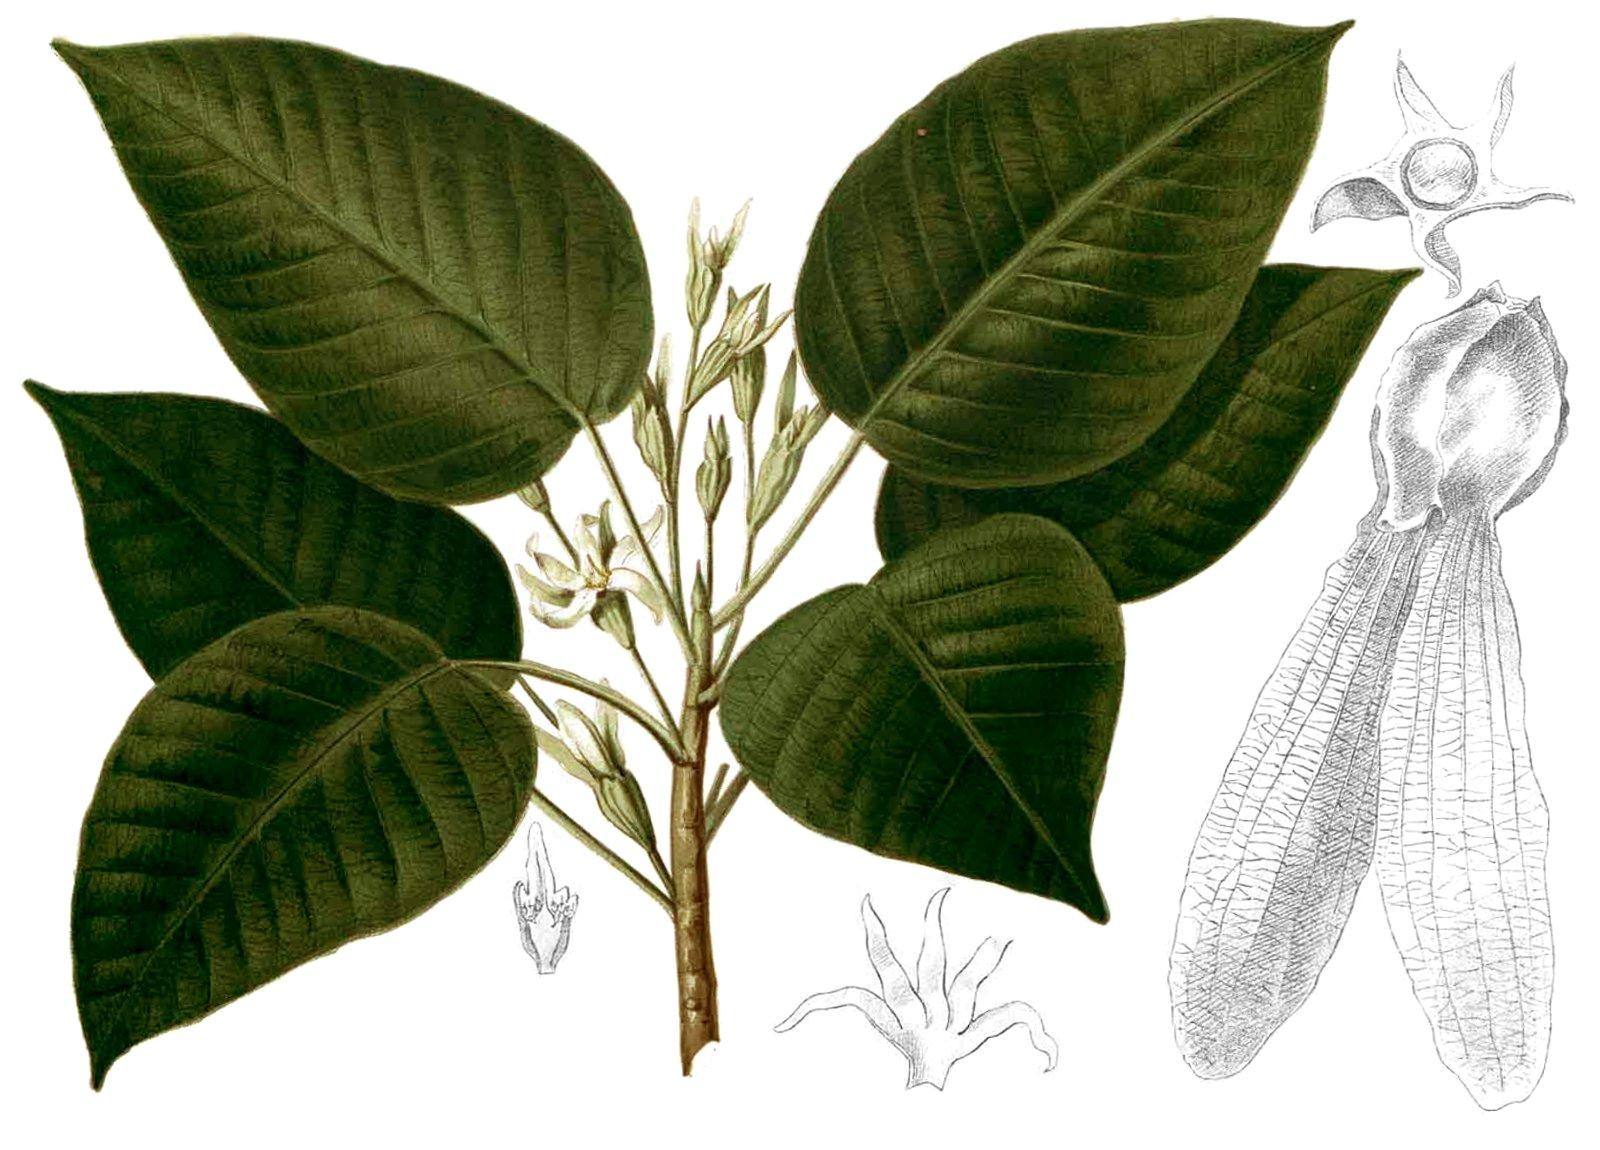 http://upload.wikimedia.org/wikipedia/commons/5/5c/Dipterocarpus_grandiflorus_Blanco2.263-cropped.jpg